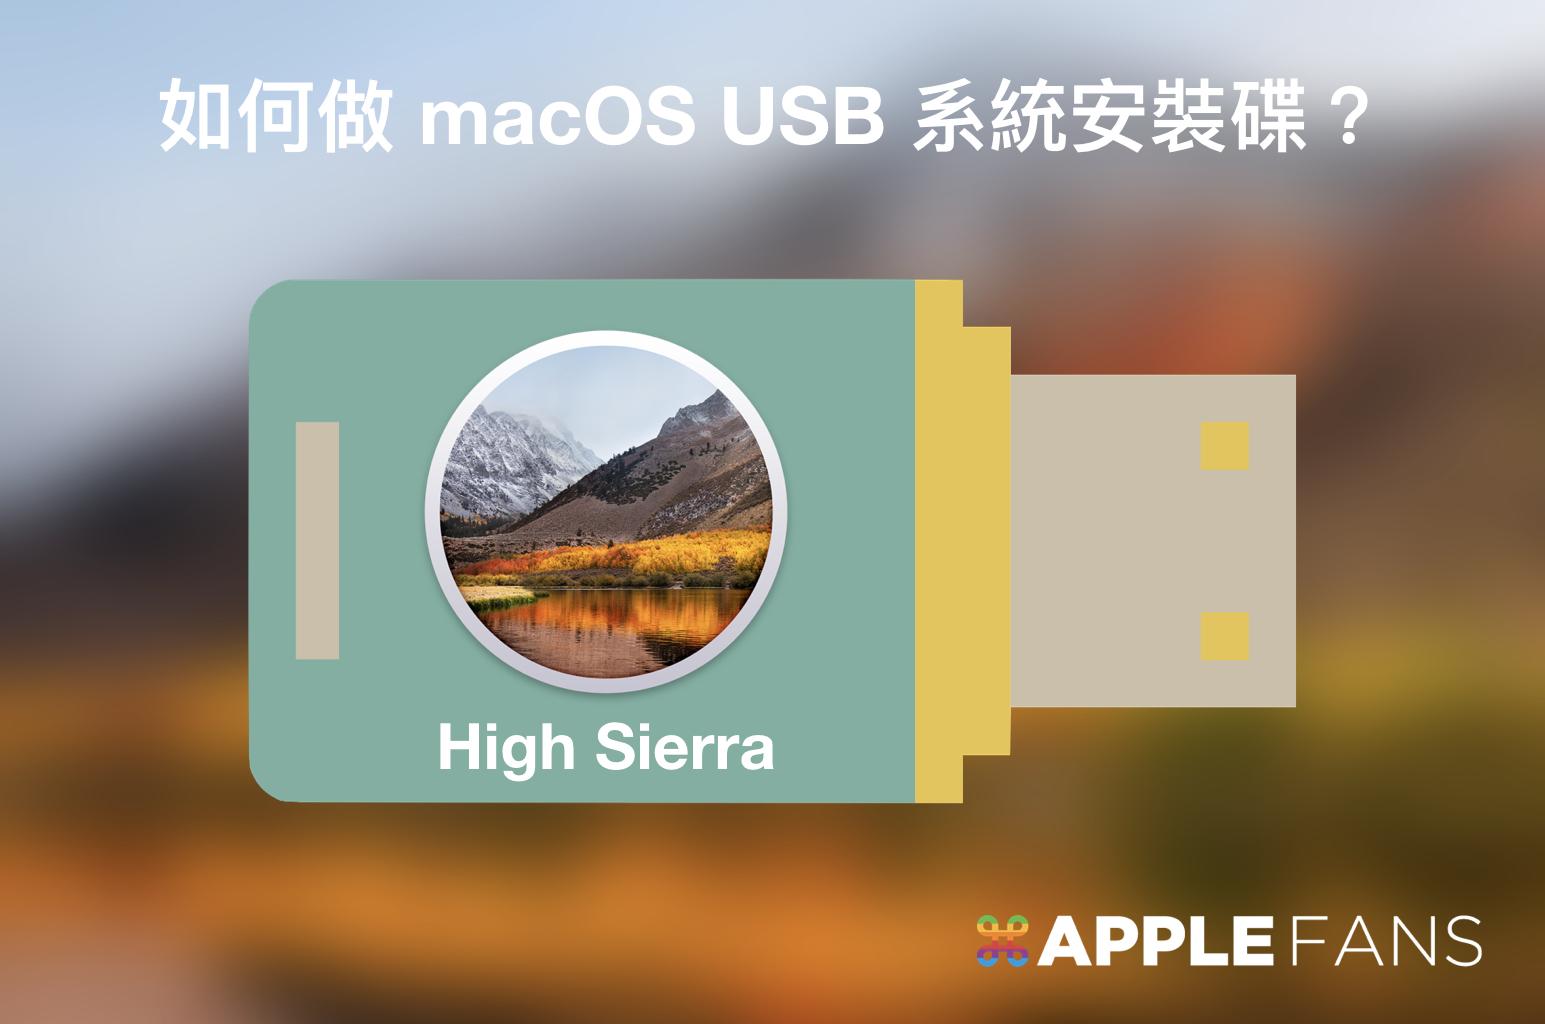 High Sierra USB